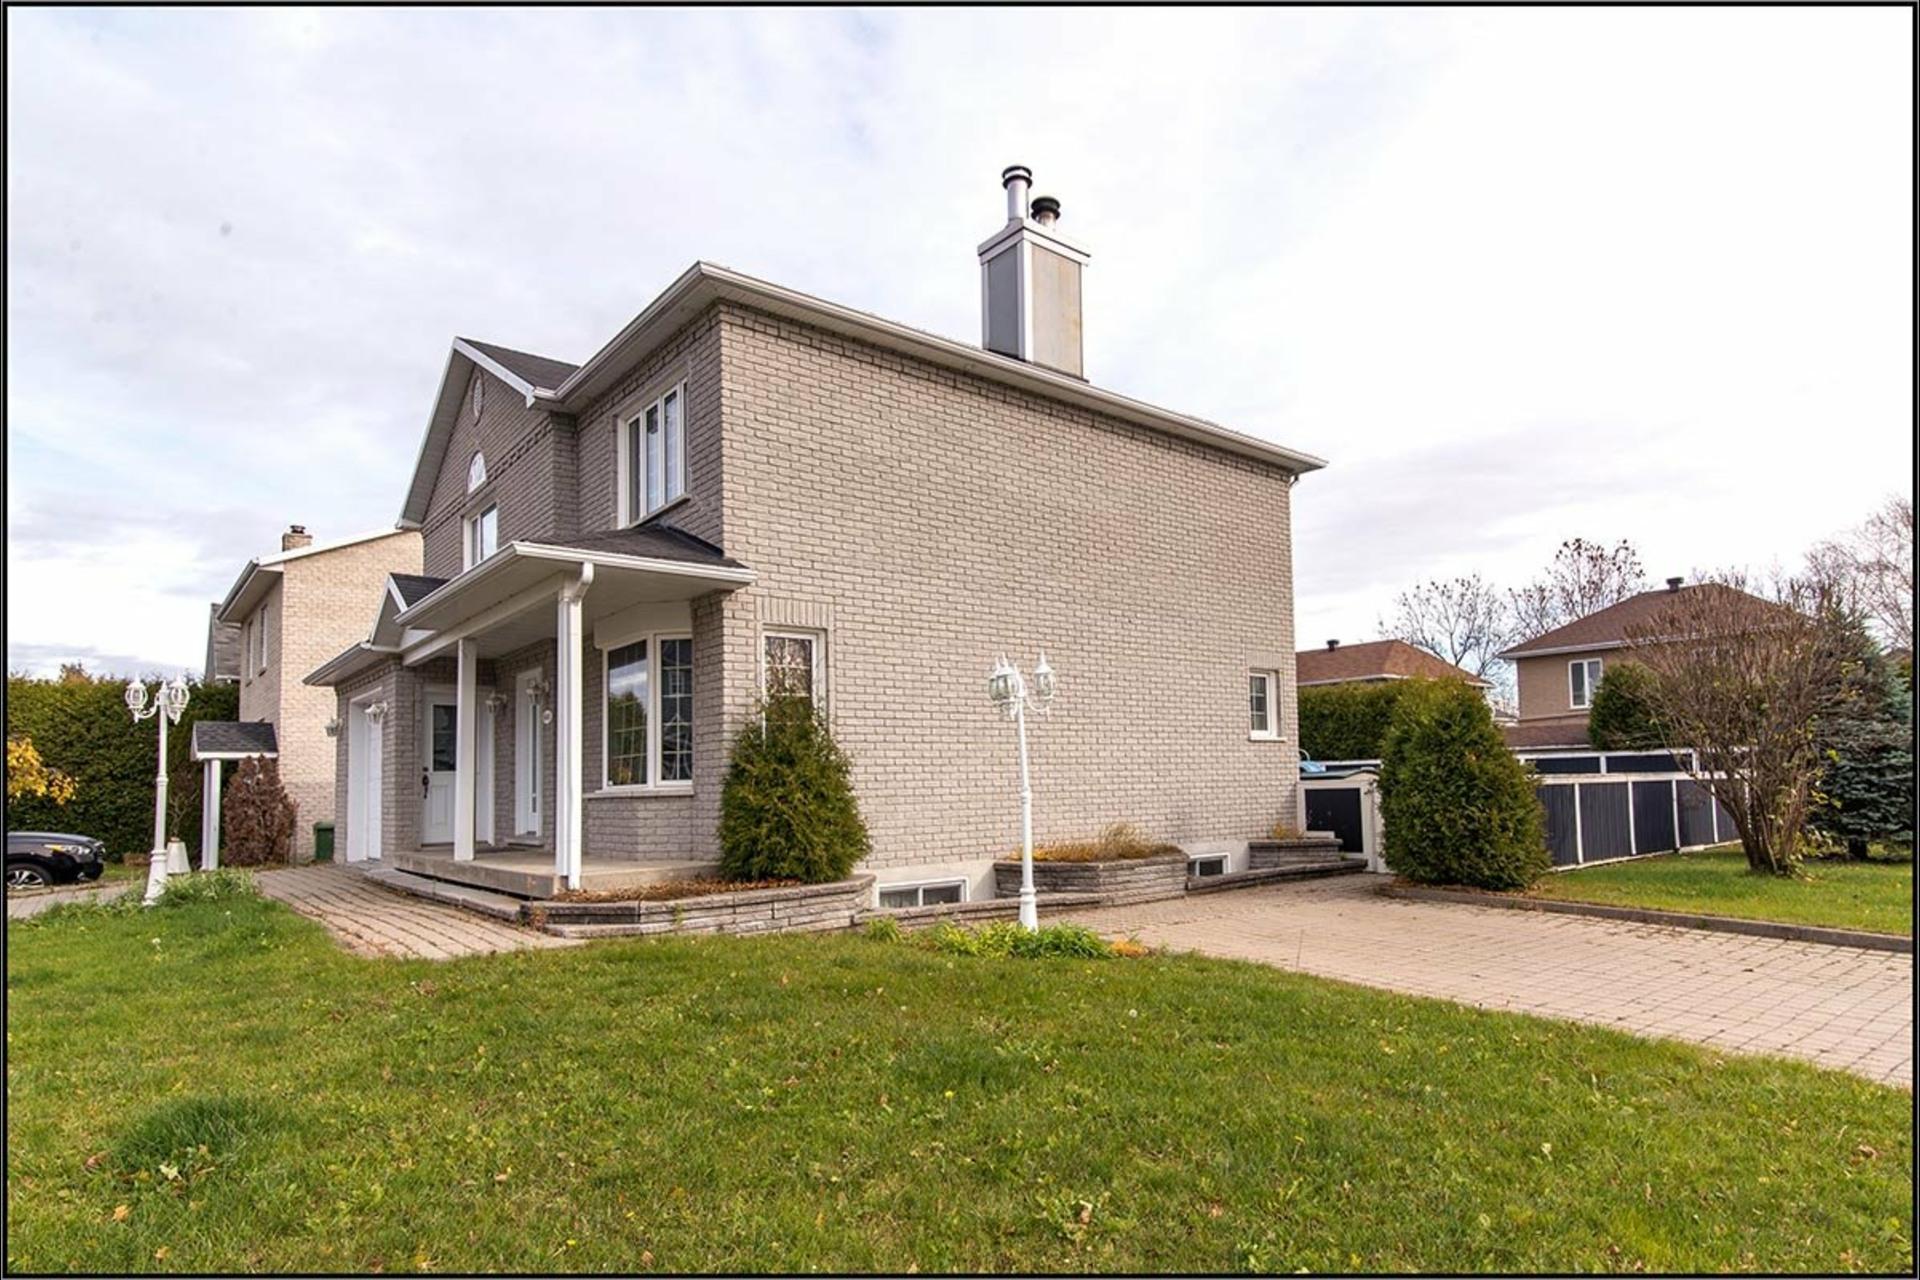 image 15 - House For sale Sainte-Foy/Sillery/Cap-Rouge Québec  - 12 rooms